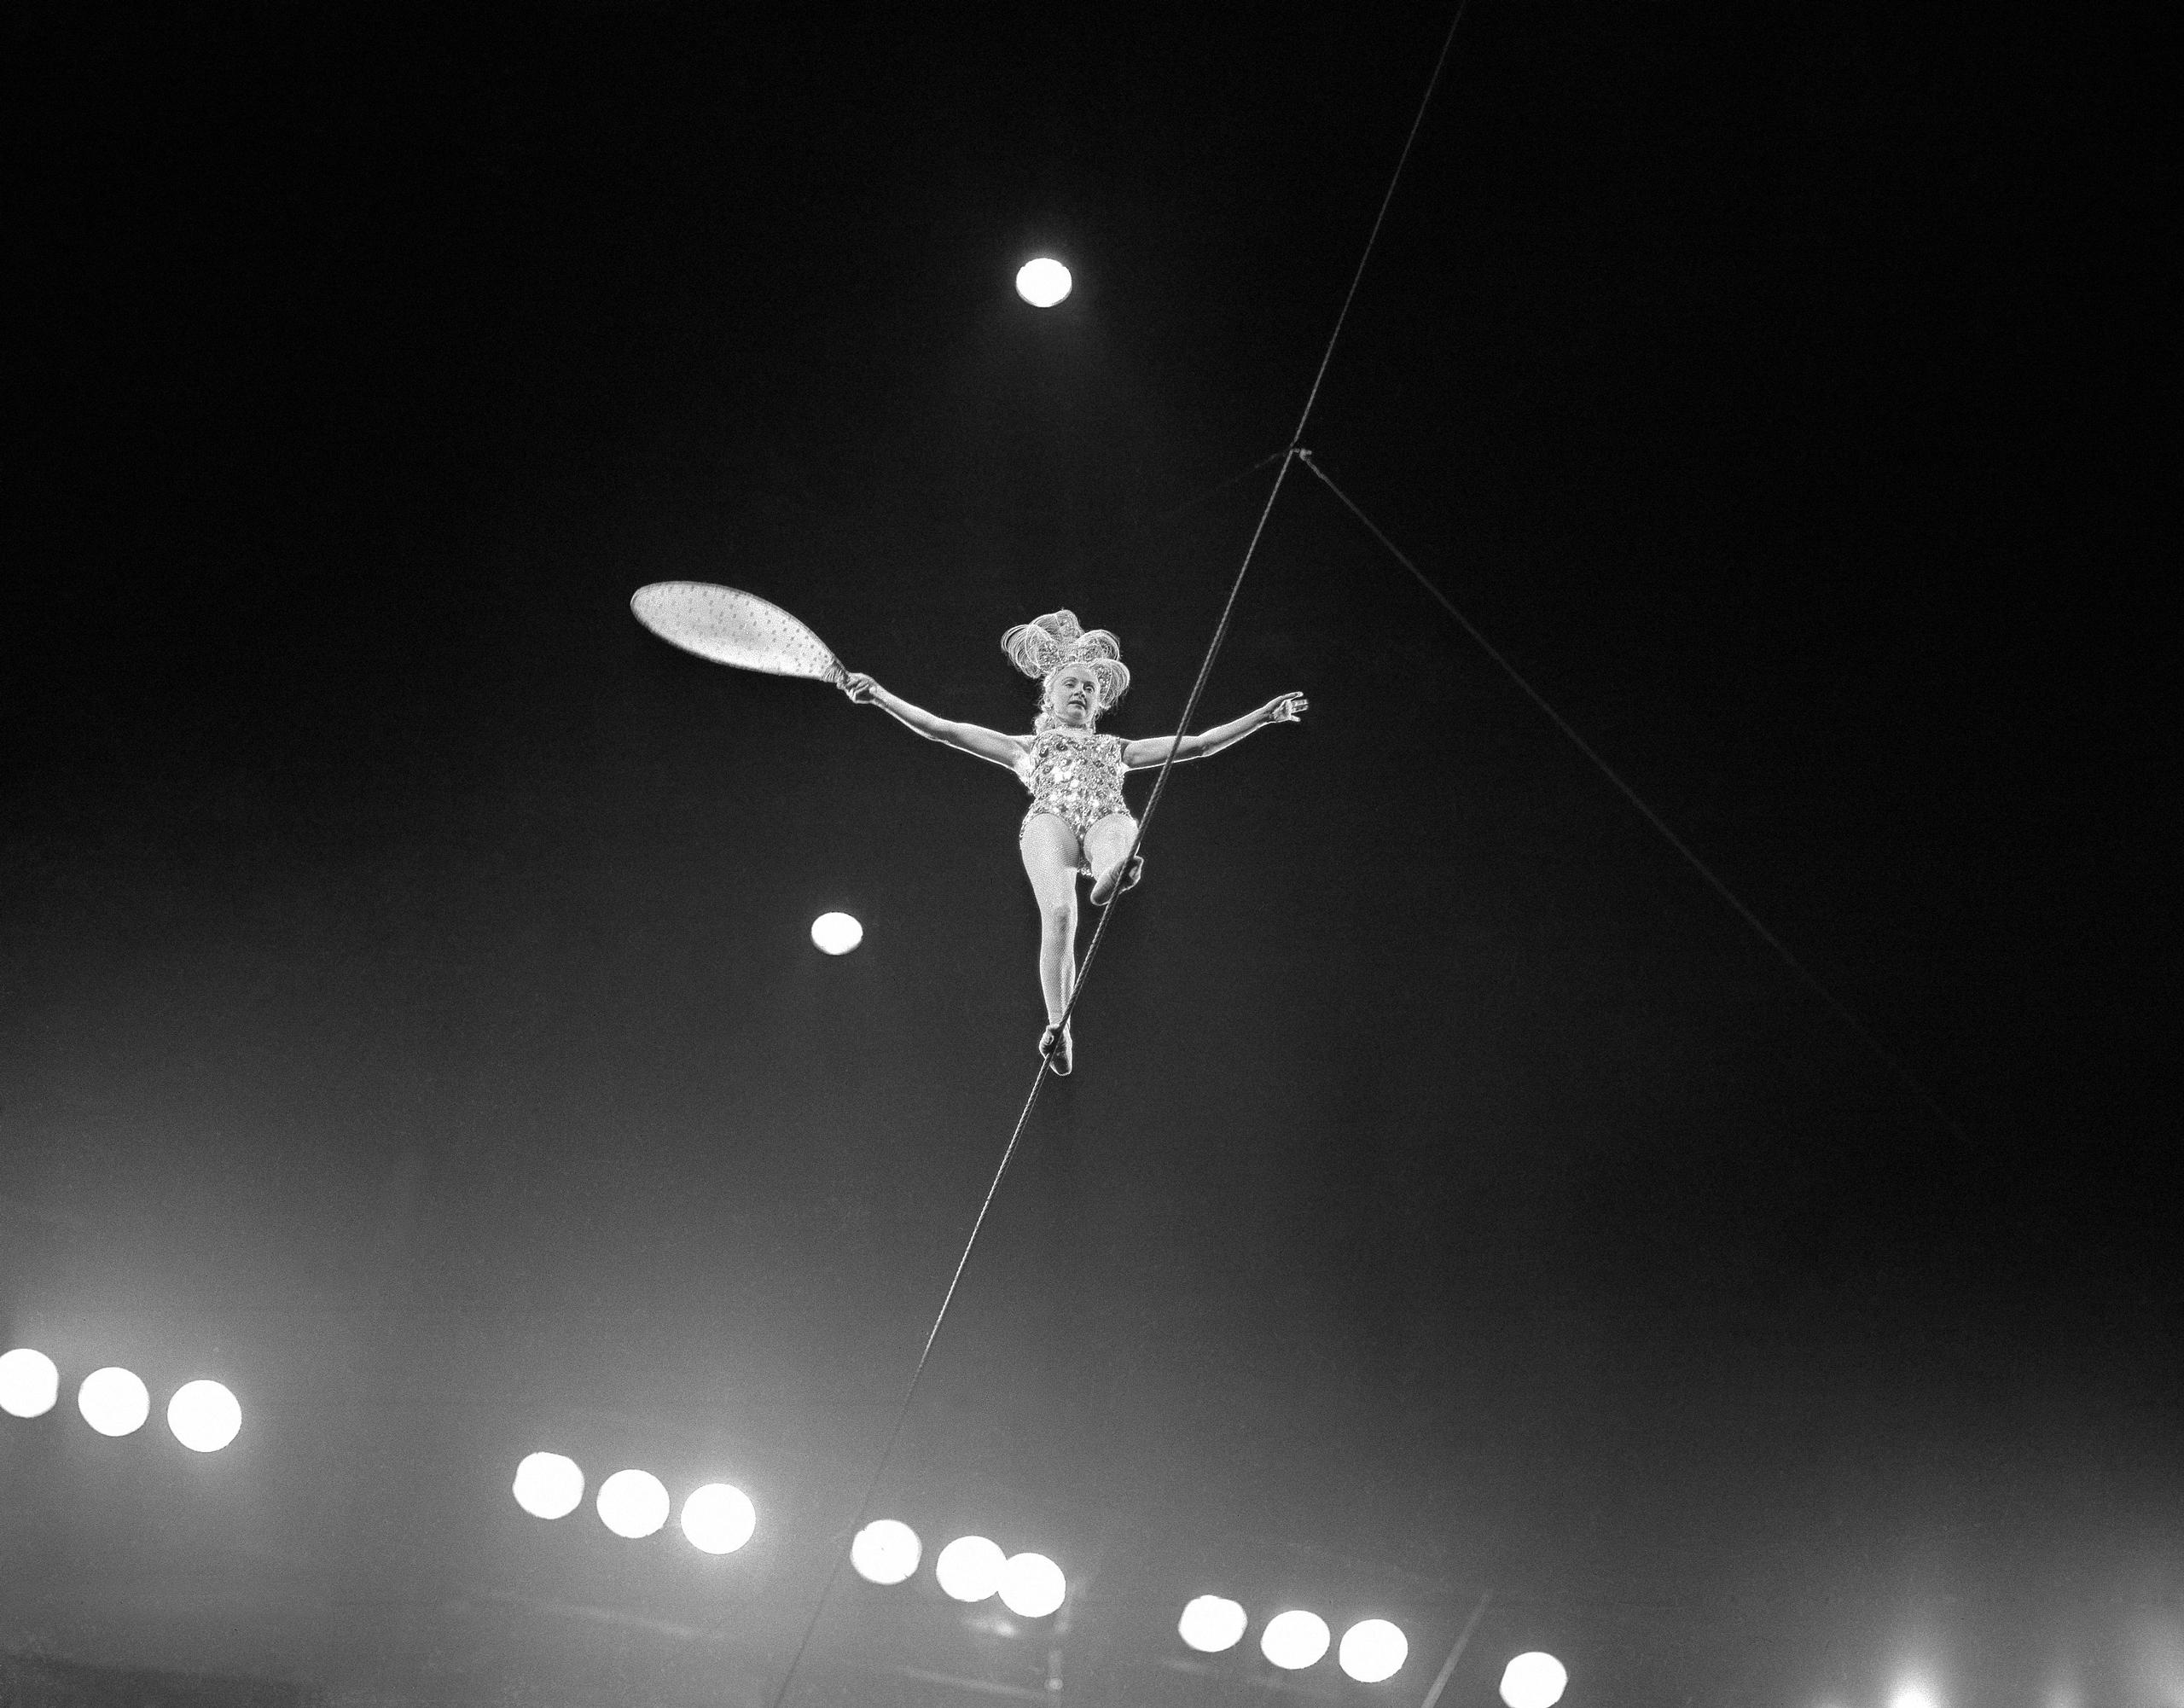 A performer walking the rope at a Ringling Bros, Barnum & Bailey circus, circa 1955.